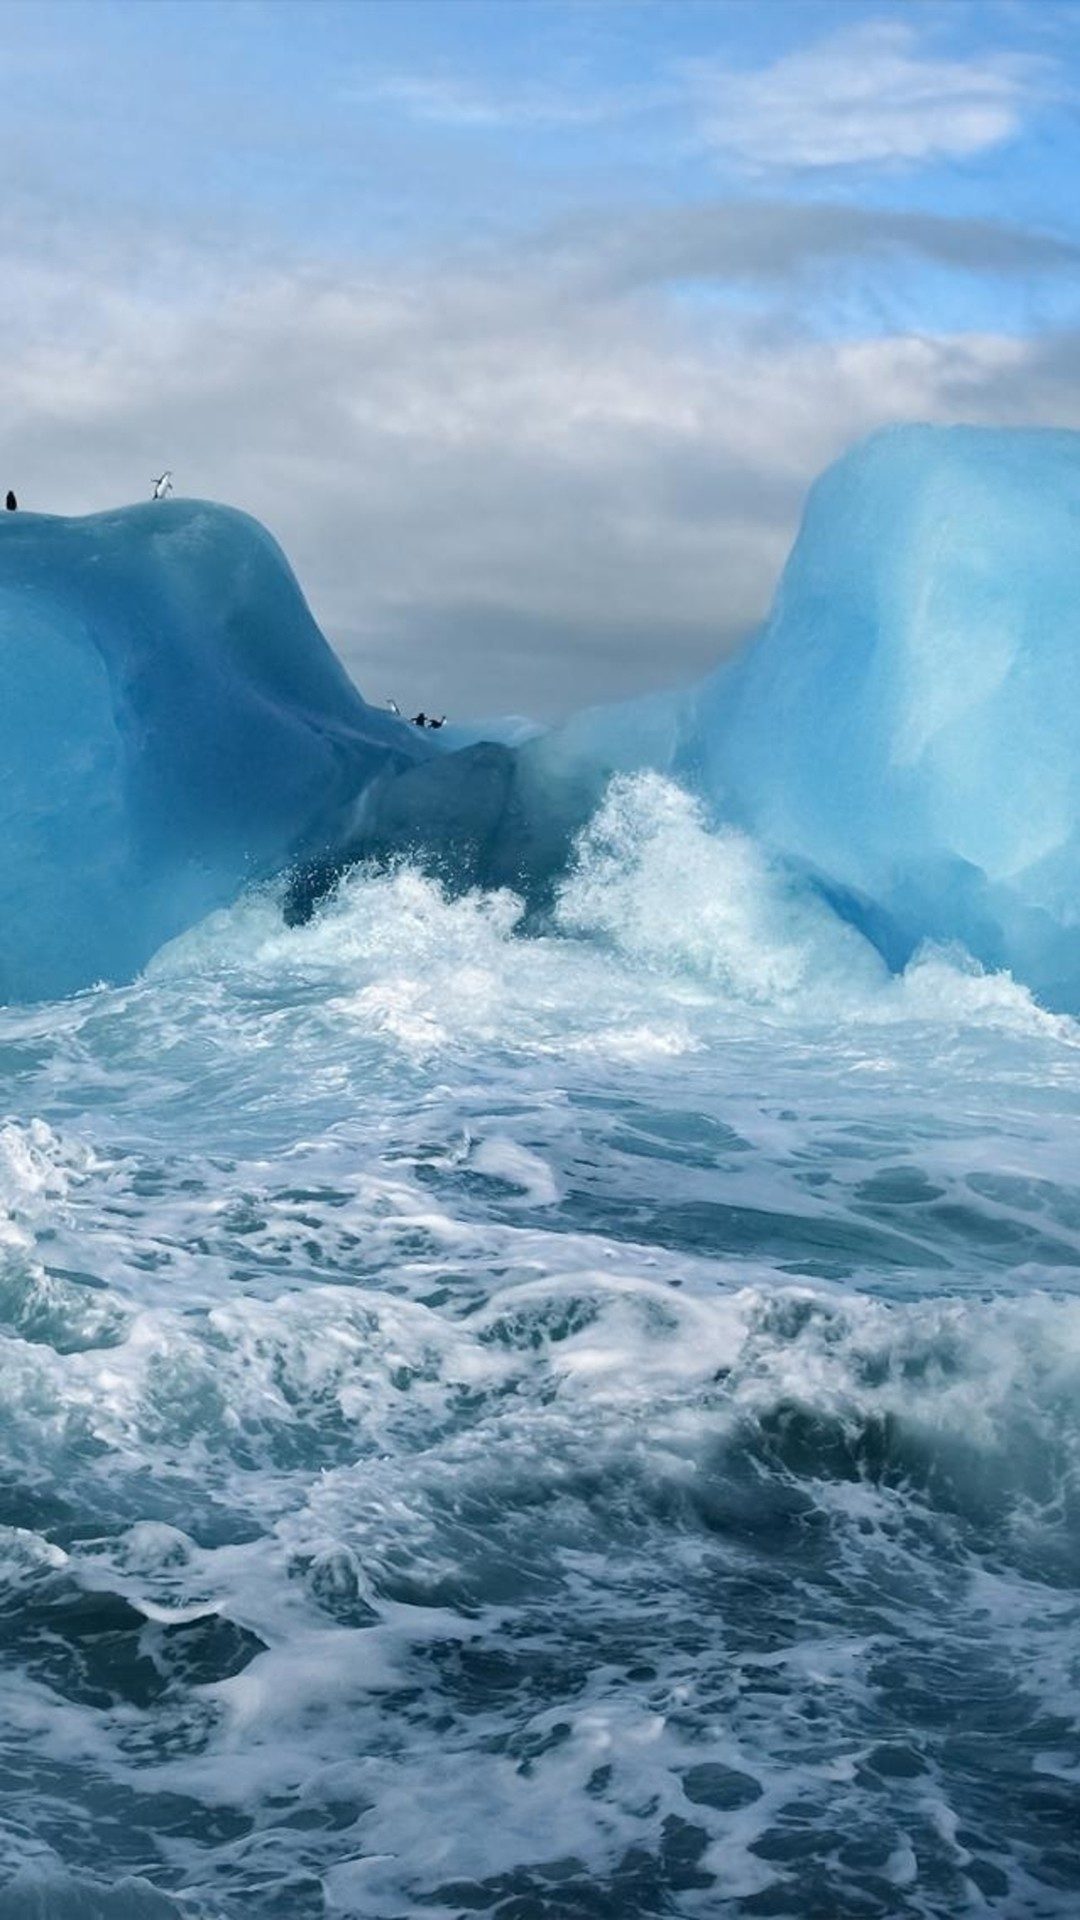 … BlueOceaniPhone6Wallpapers Iphone Ocean Wallpaper Ocean Surging Wave  Penguin Iceberg iphone 6 wallpaper ilikewallpaper_com …